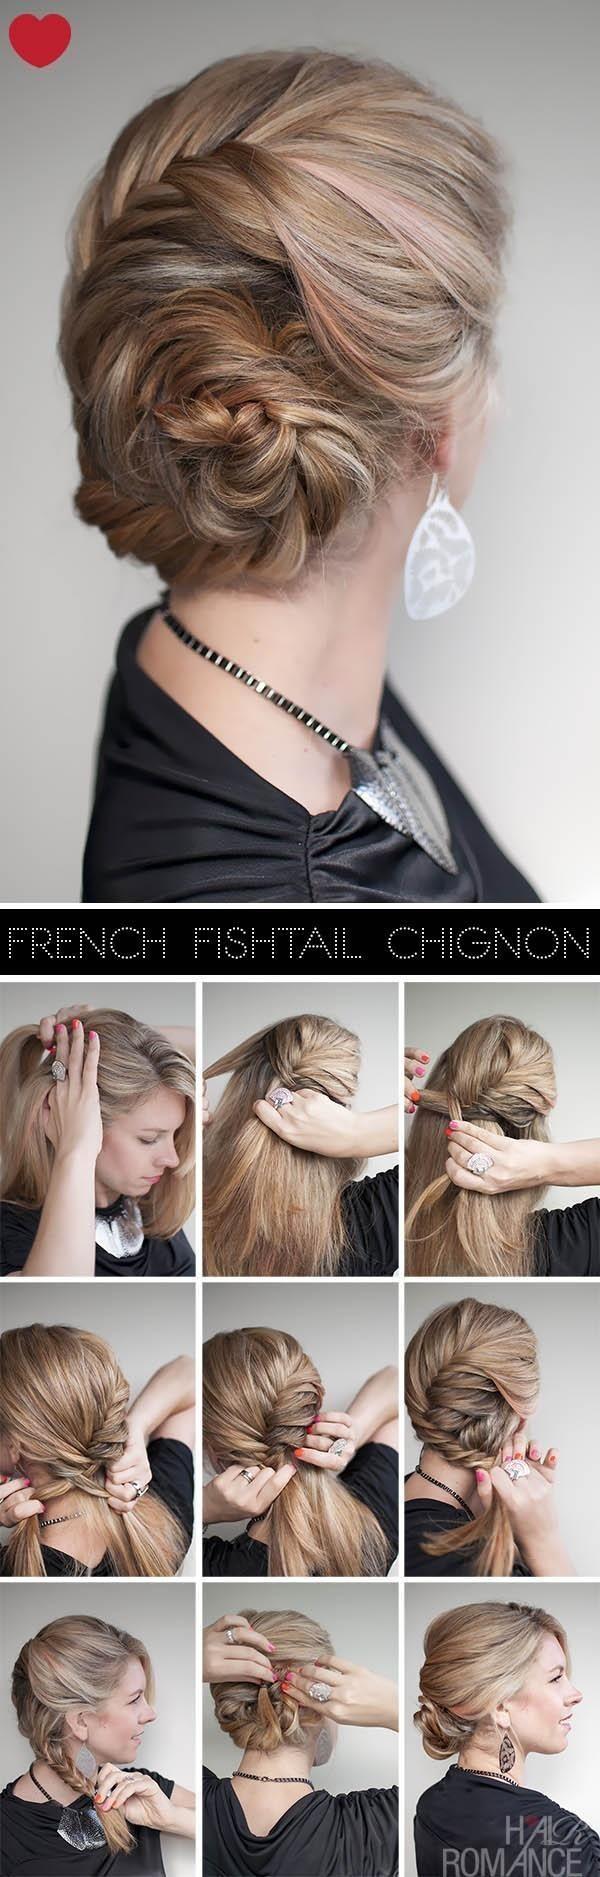 French fishtail chignon- super cool!